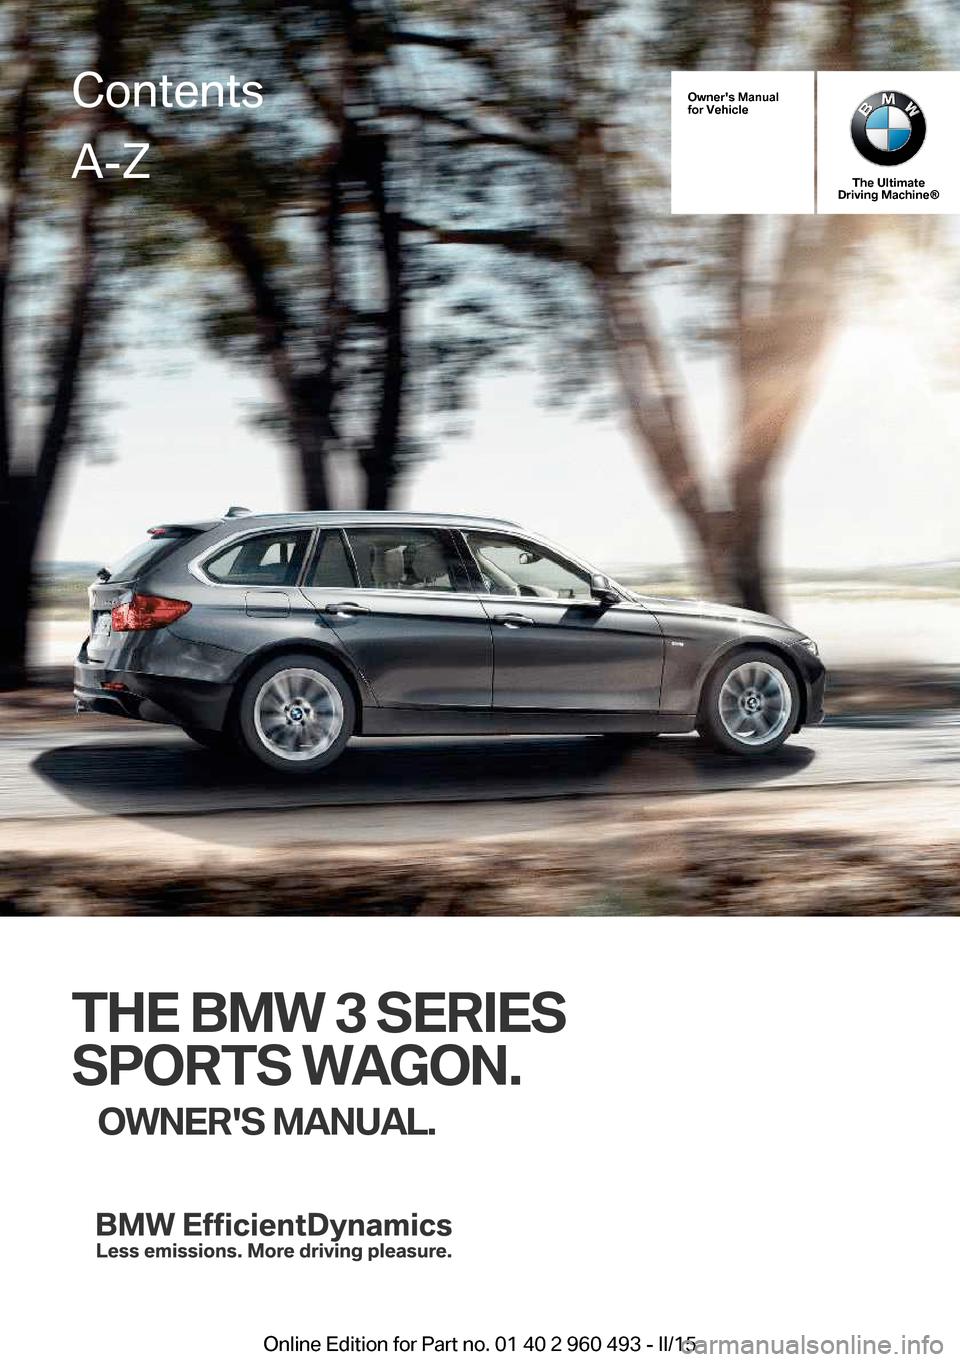 BMW SERIES SPORTS WAGON F Owners Manual - Bmw 3 series sports wagon